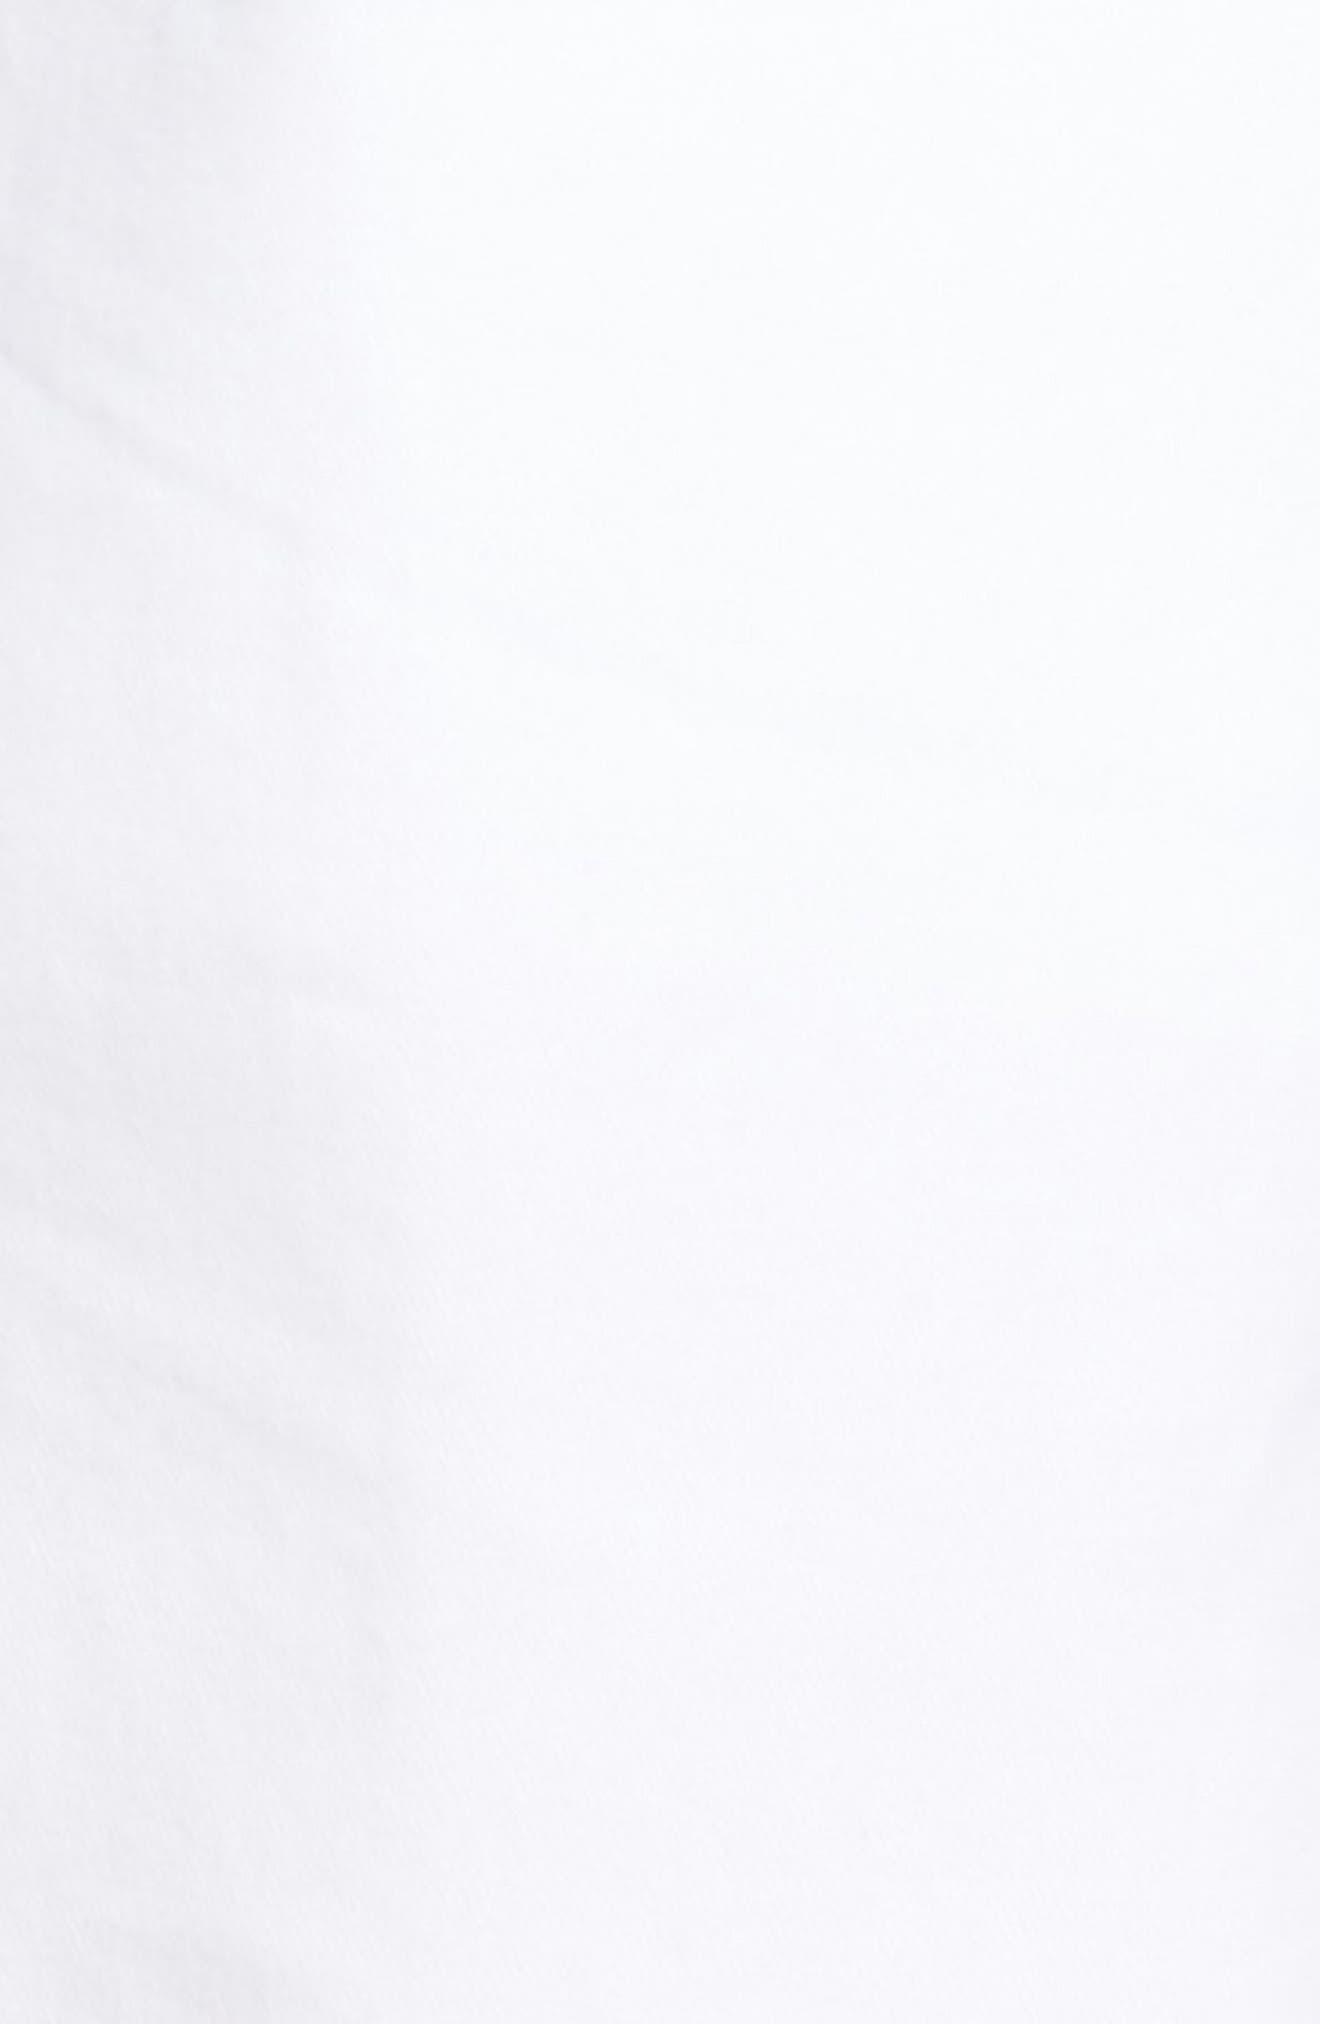 Ballard Slim Fit Stretch Chino 9-Inch Shorts,                             Alternate thumbnail 5, color,                             WHITE